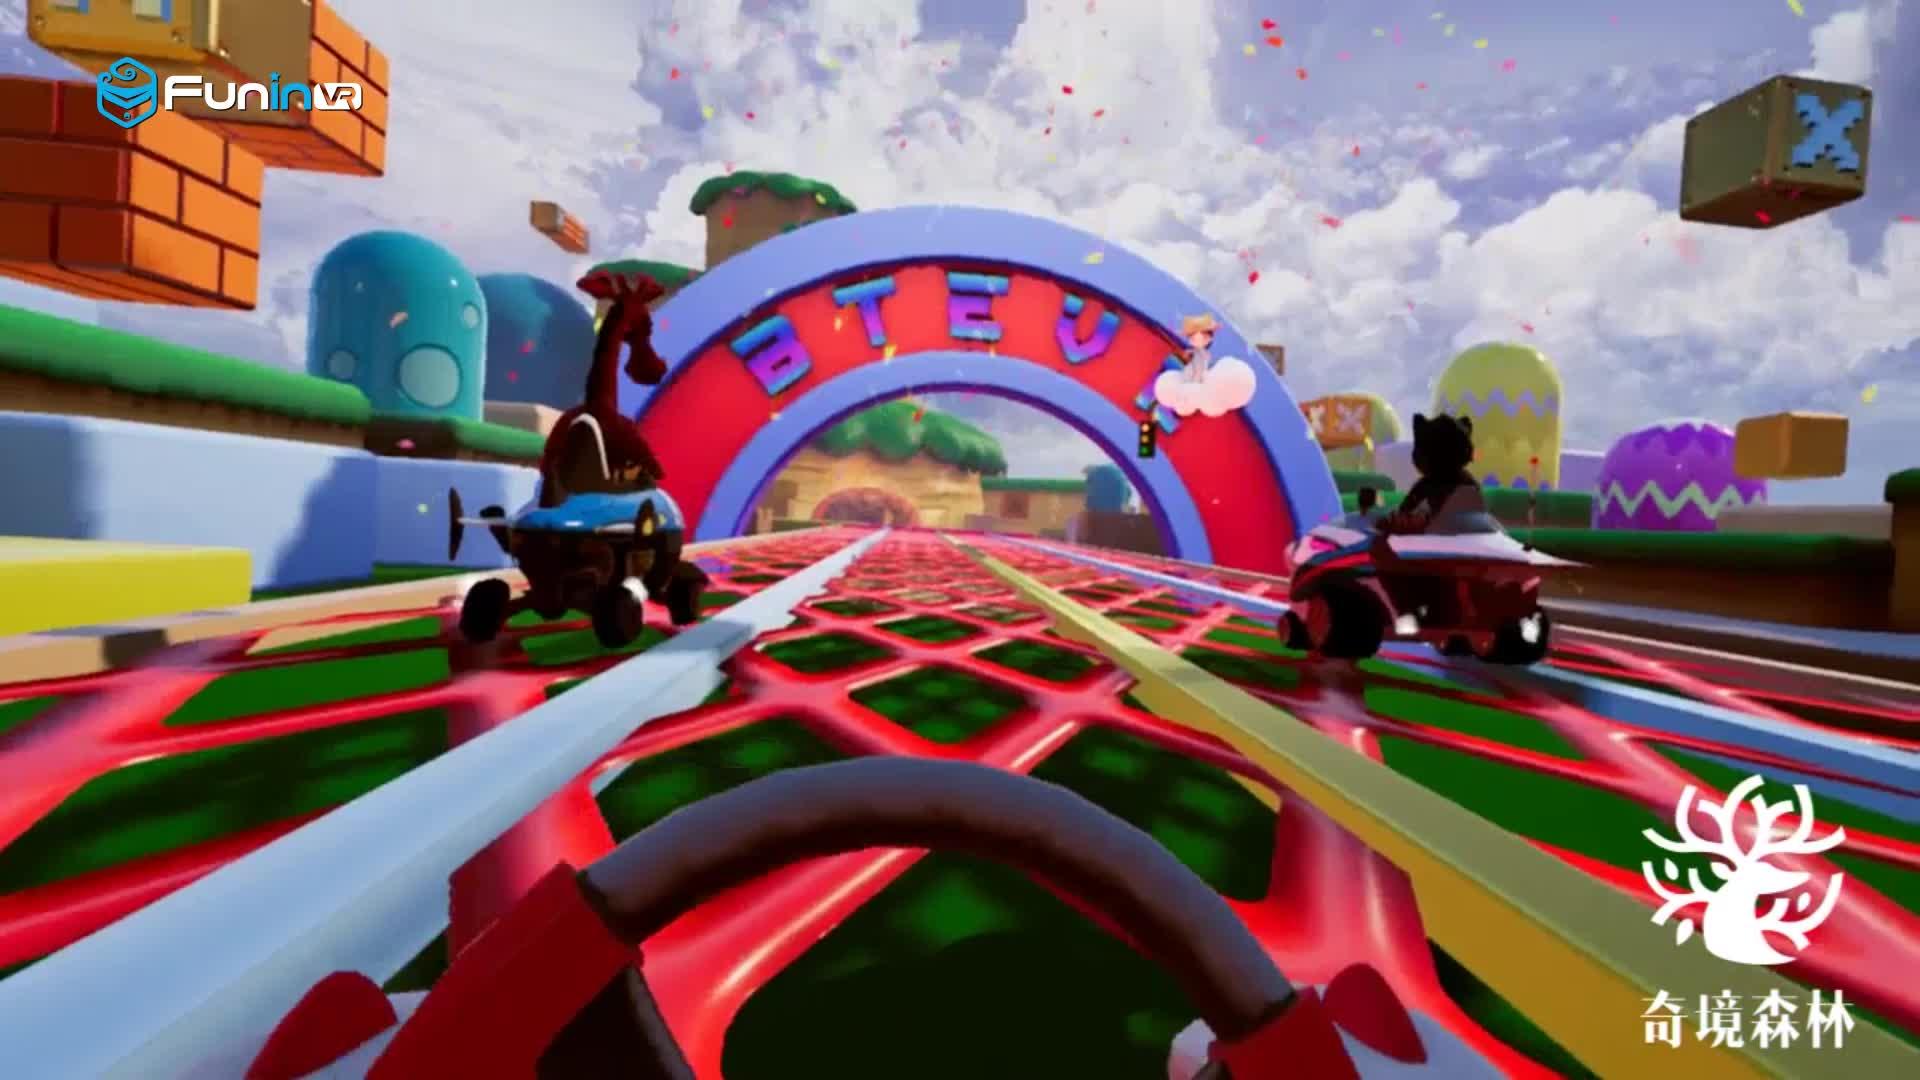 Earn Money Quickly! VR Racing Kart 9d Vr Simulator Dynamic Platform VR Game machine